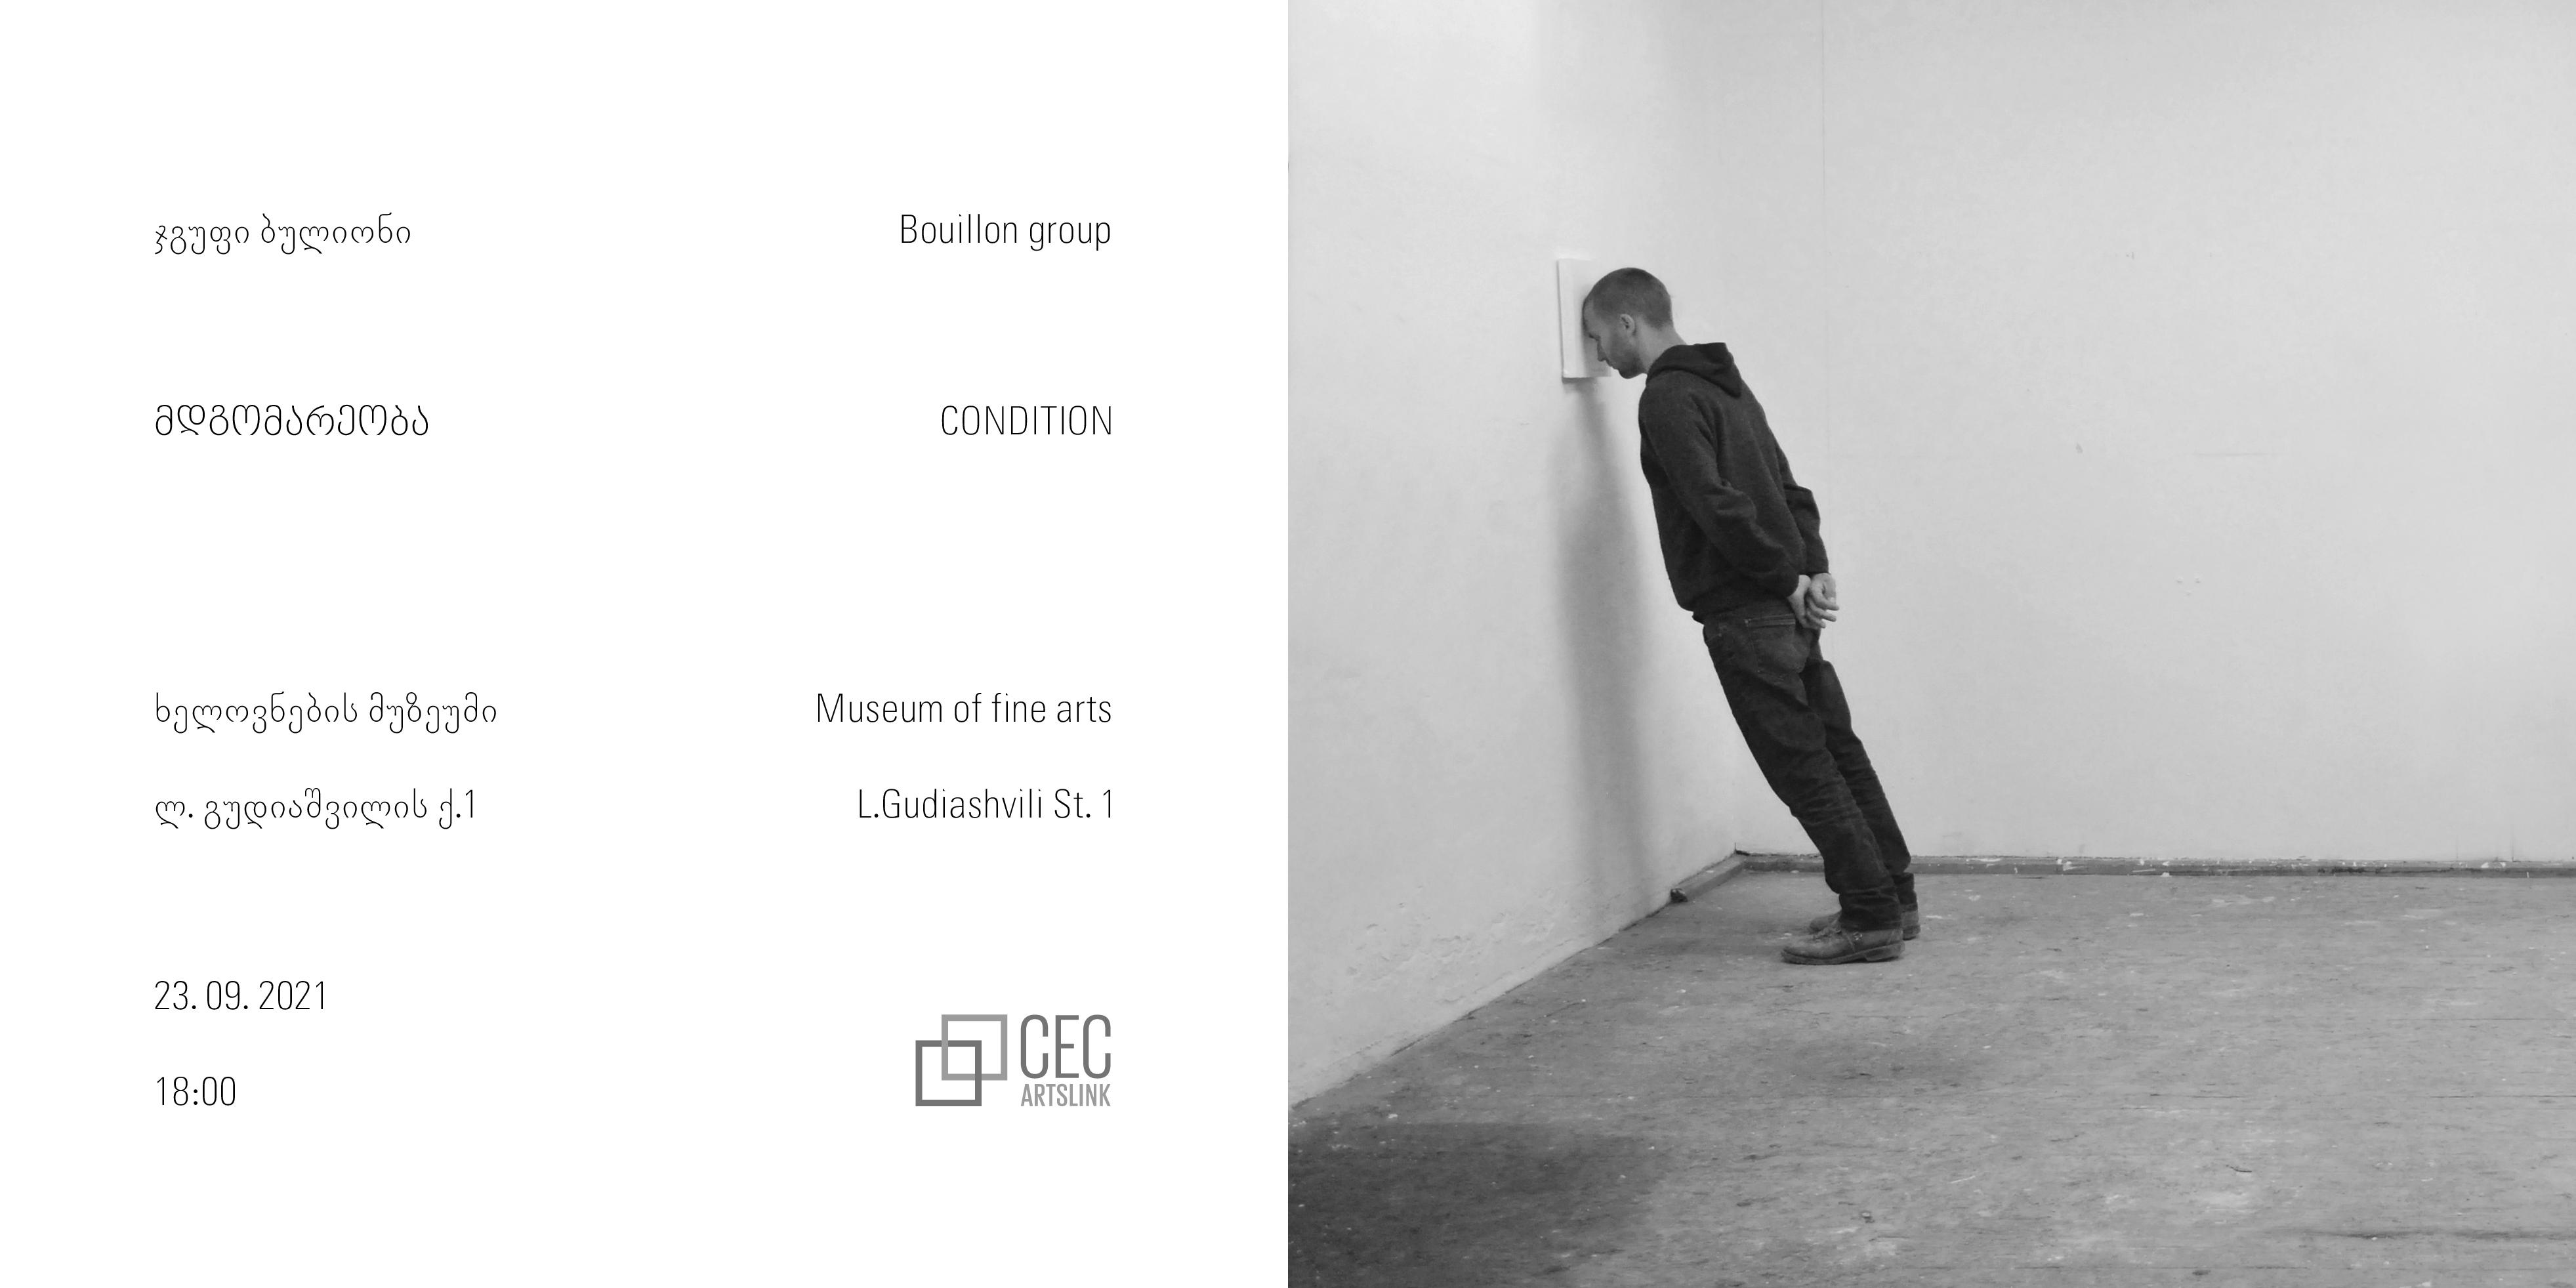 Bouillon Group_მდგომარეობა_Condition_23.09